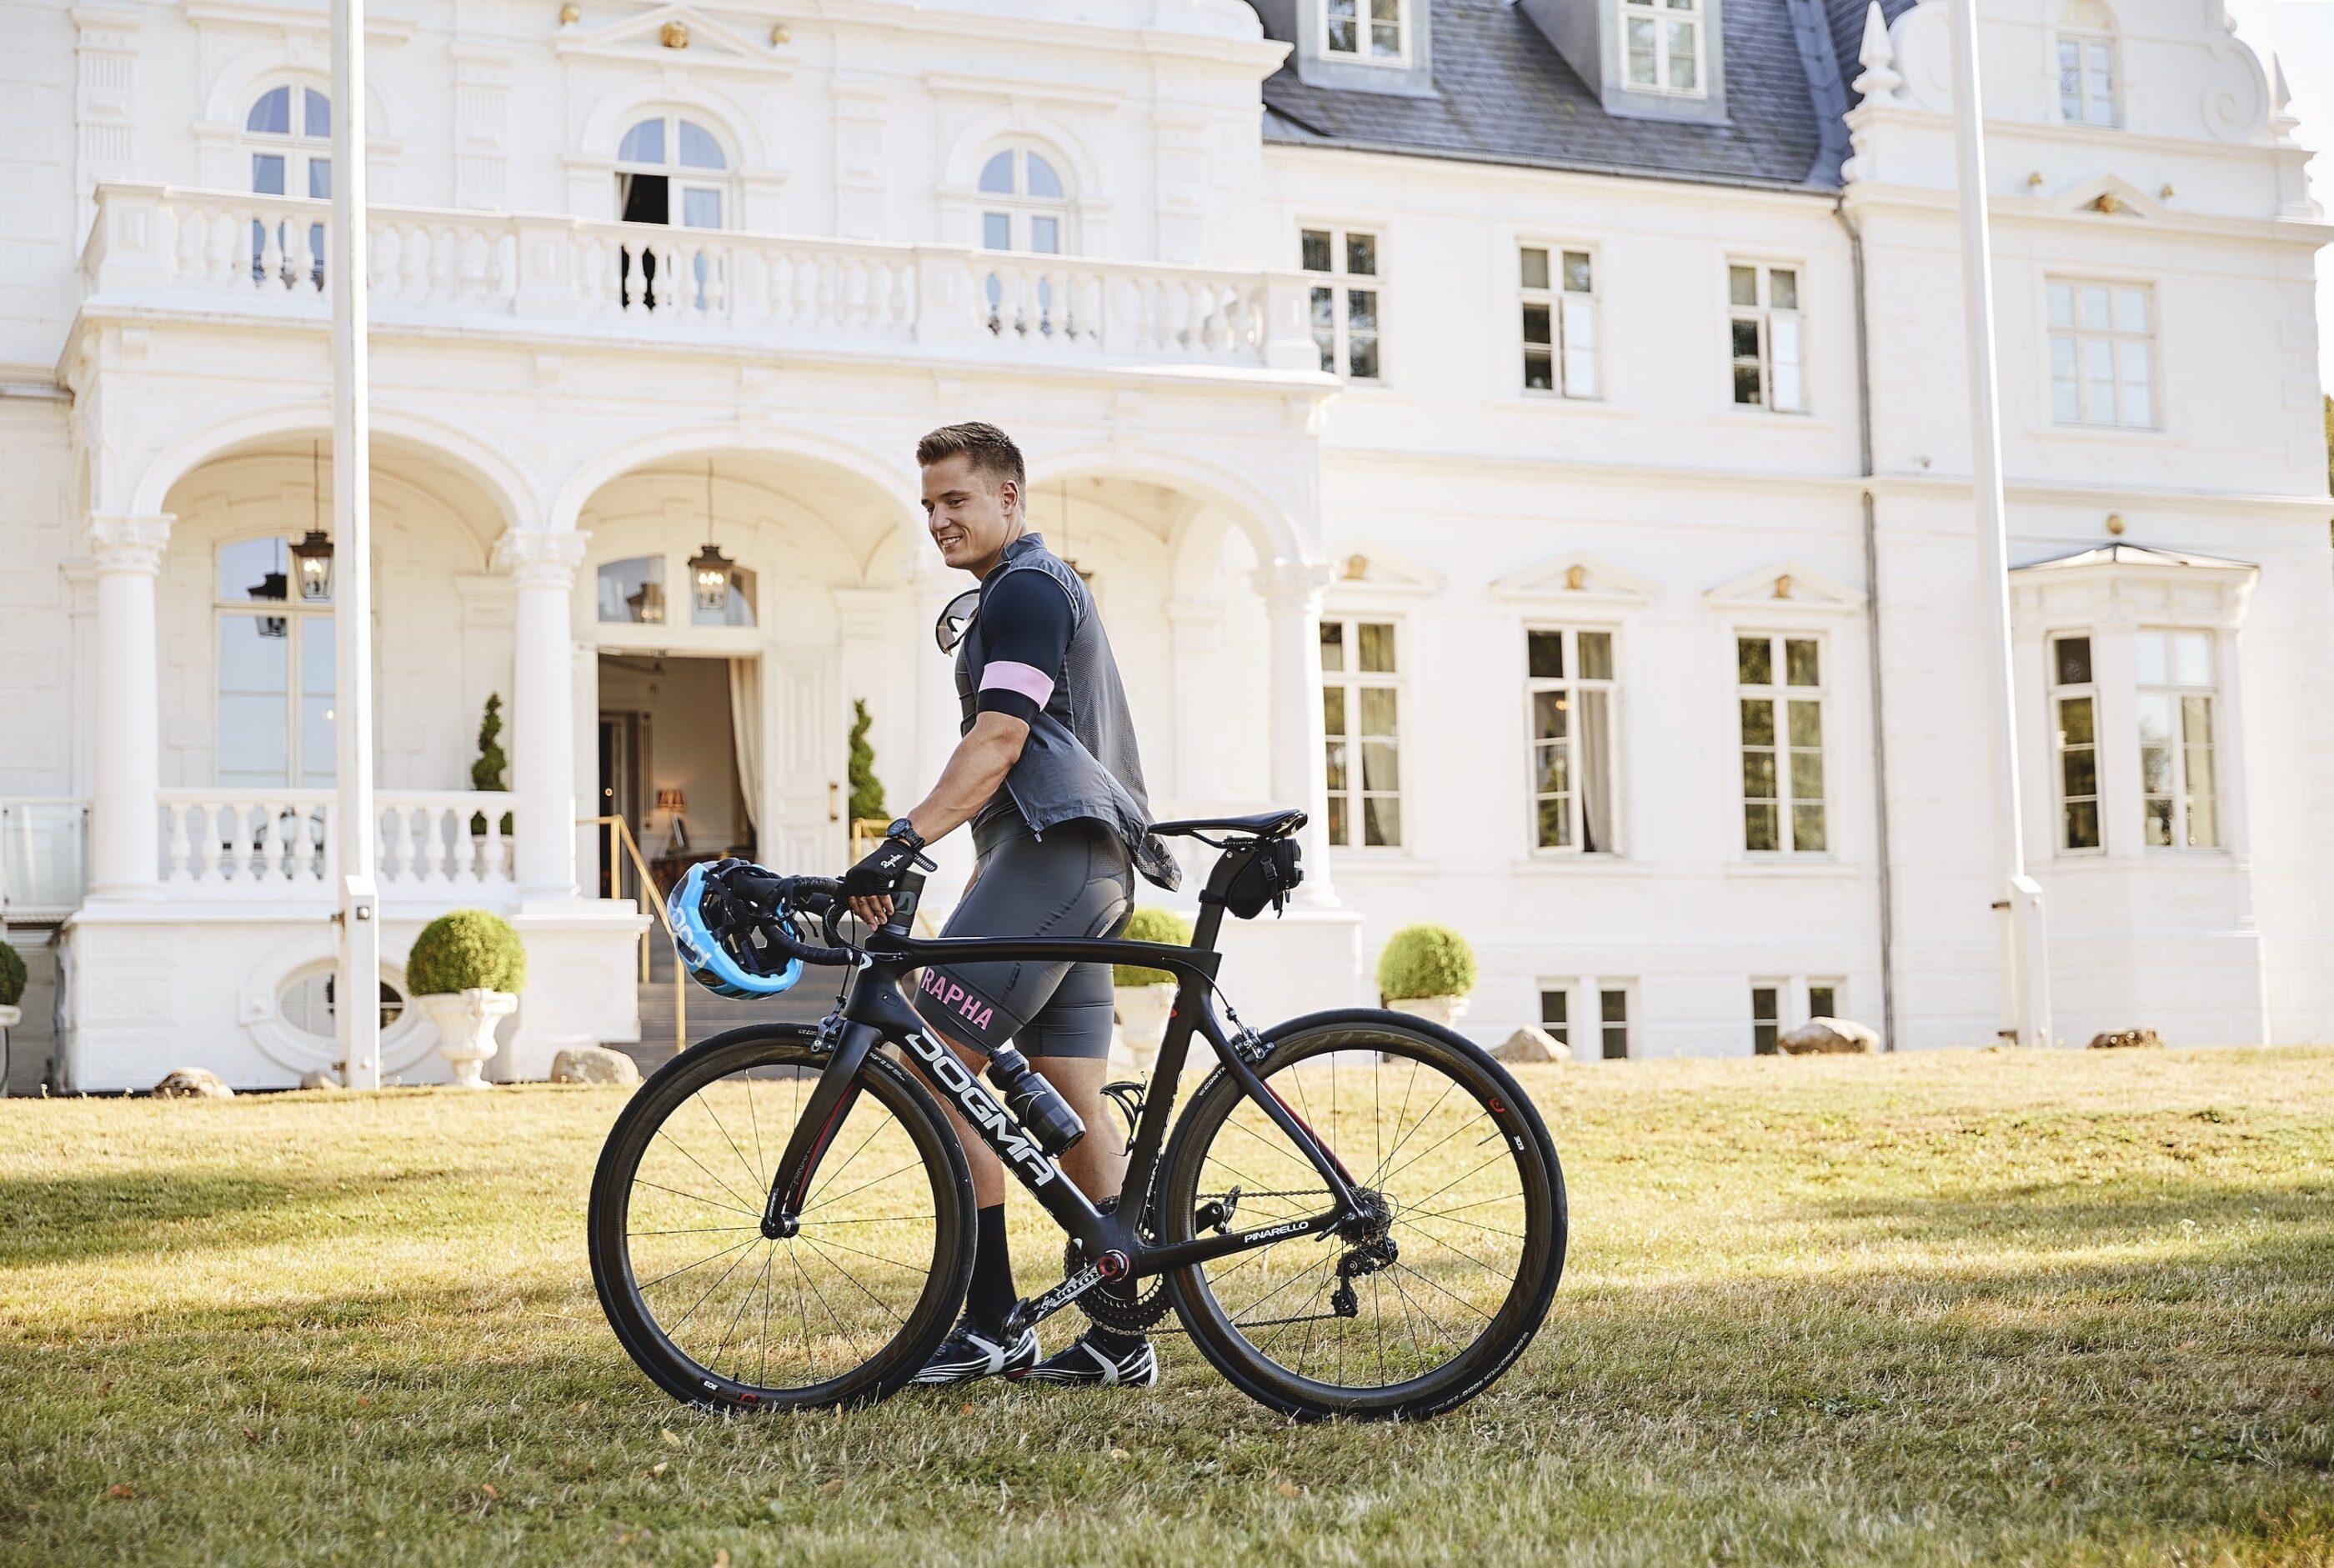 En mand iklædt cykeltøj står ude i slottets have med en sportscykel